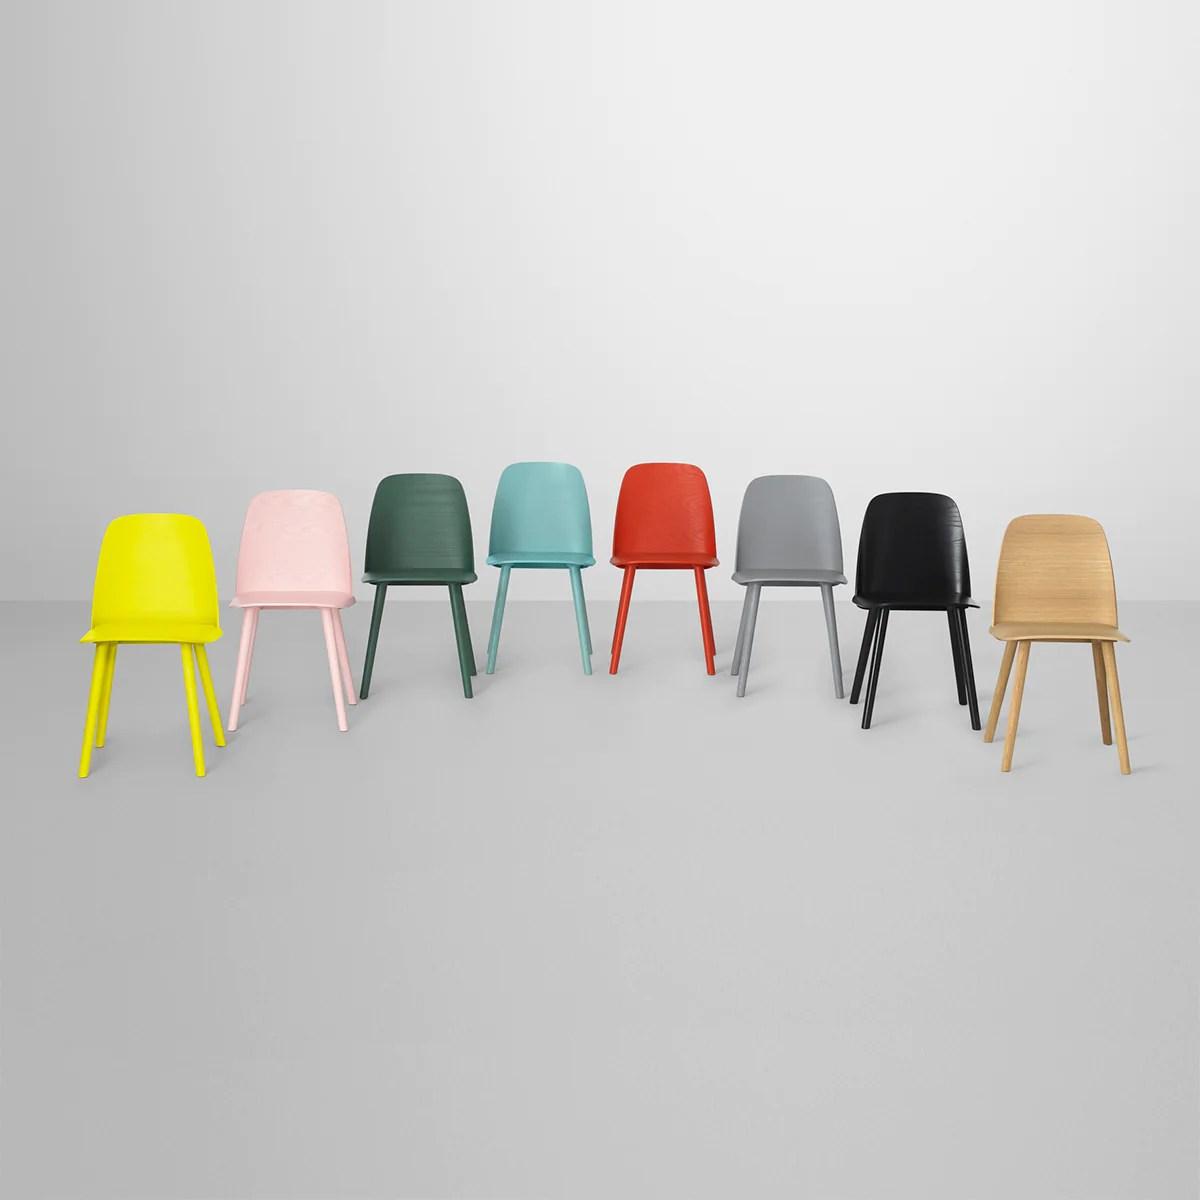 nerd chair muuto chairs at makro 書呆子 木質 單椅 luxury life 傢具 燈飾 and 生活配件